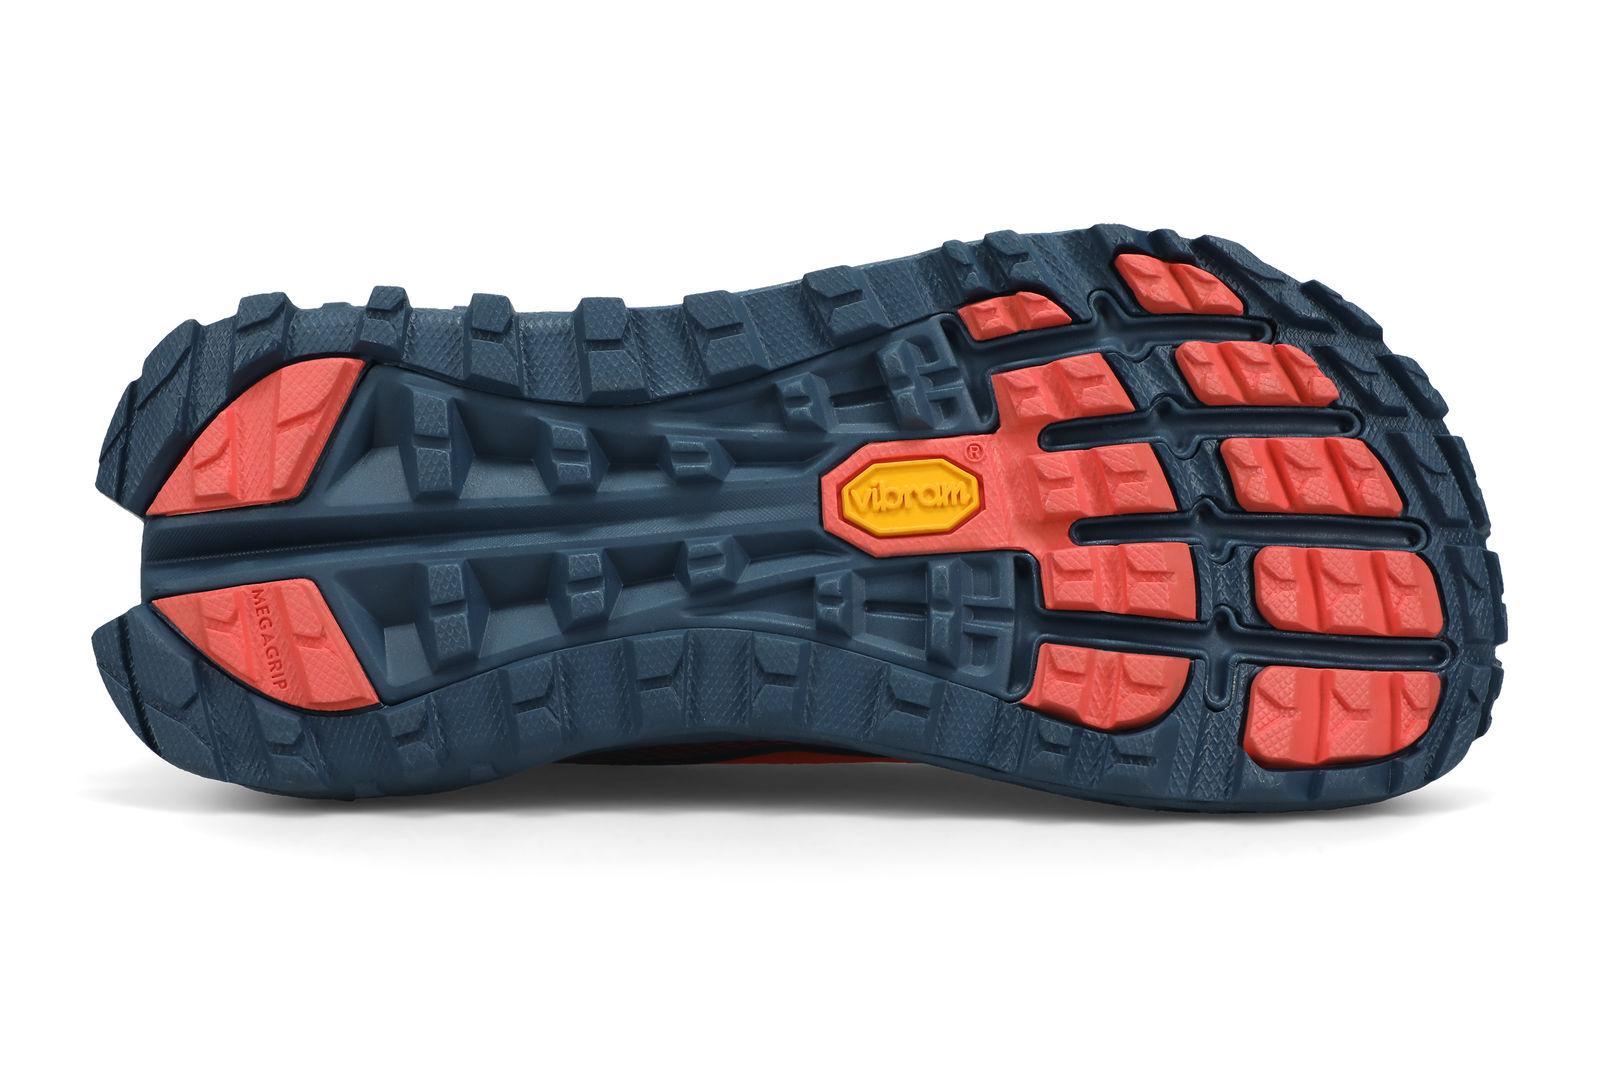 Altra shoes Running Olympus 4.0 - Παπούτσια Altra - Παπούτσια Απορρόφησης - Altraελλαδα - greece αθλητικά altra performance store -